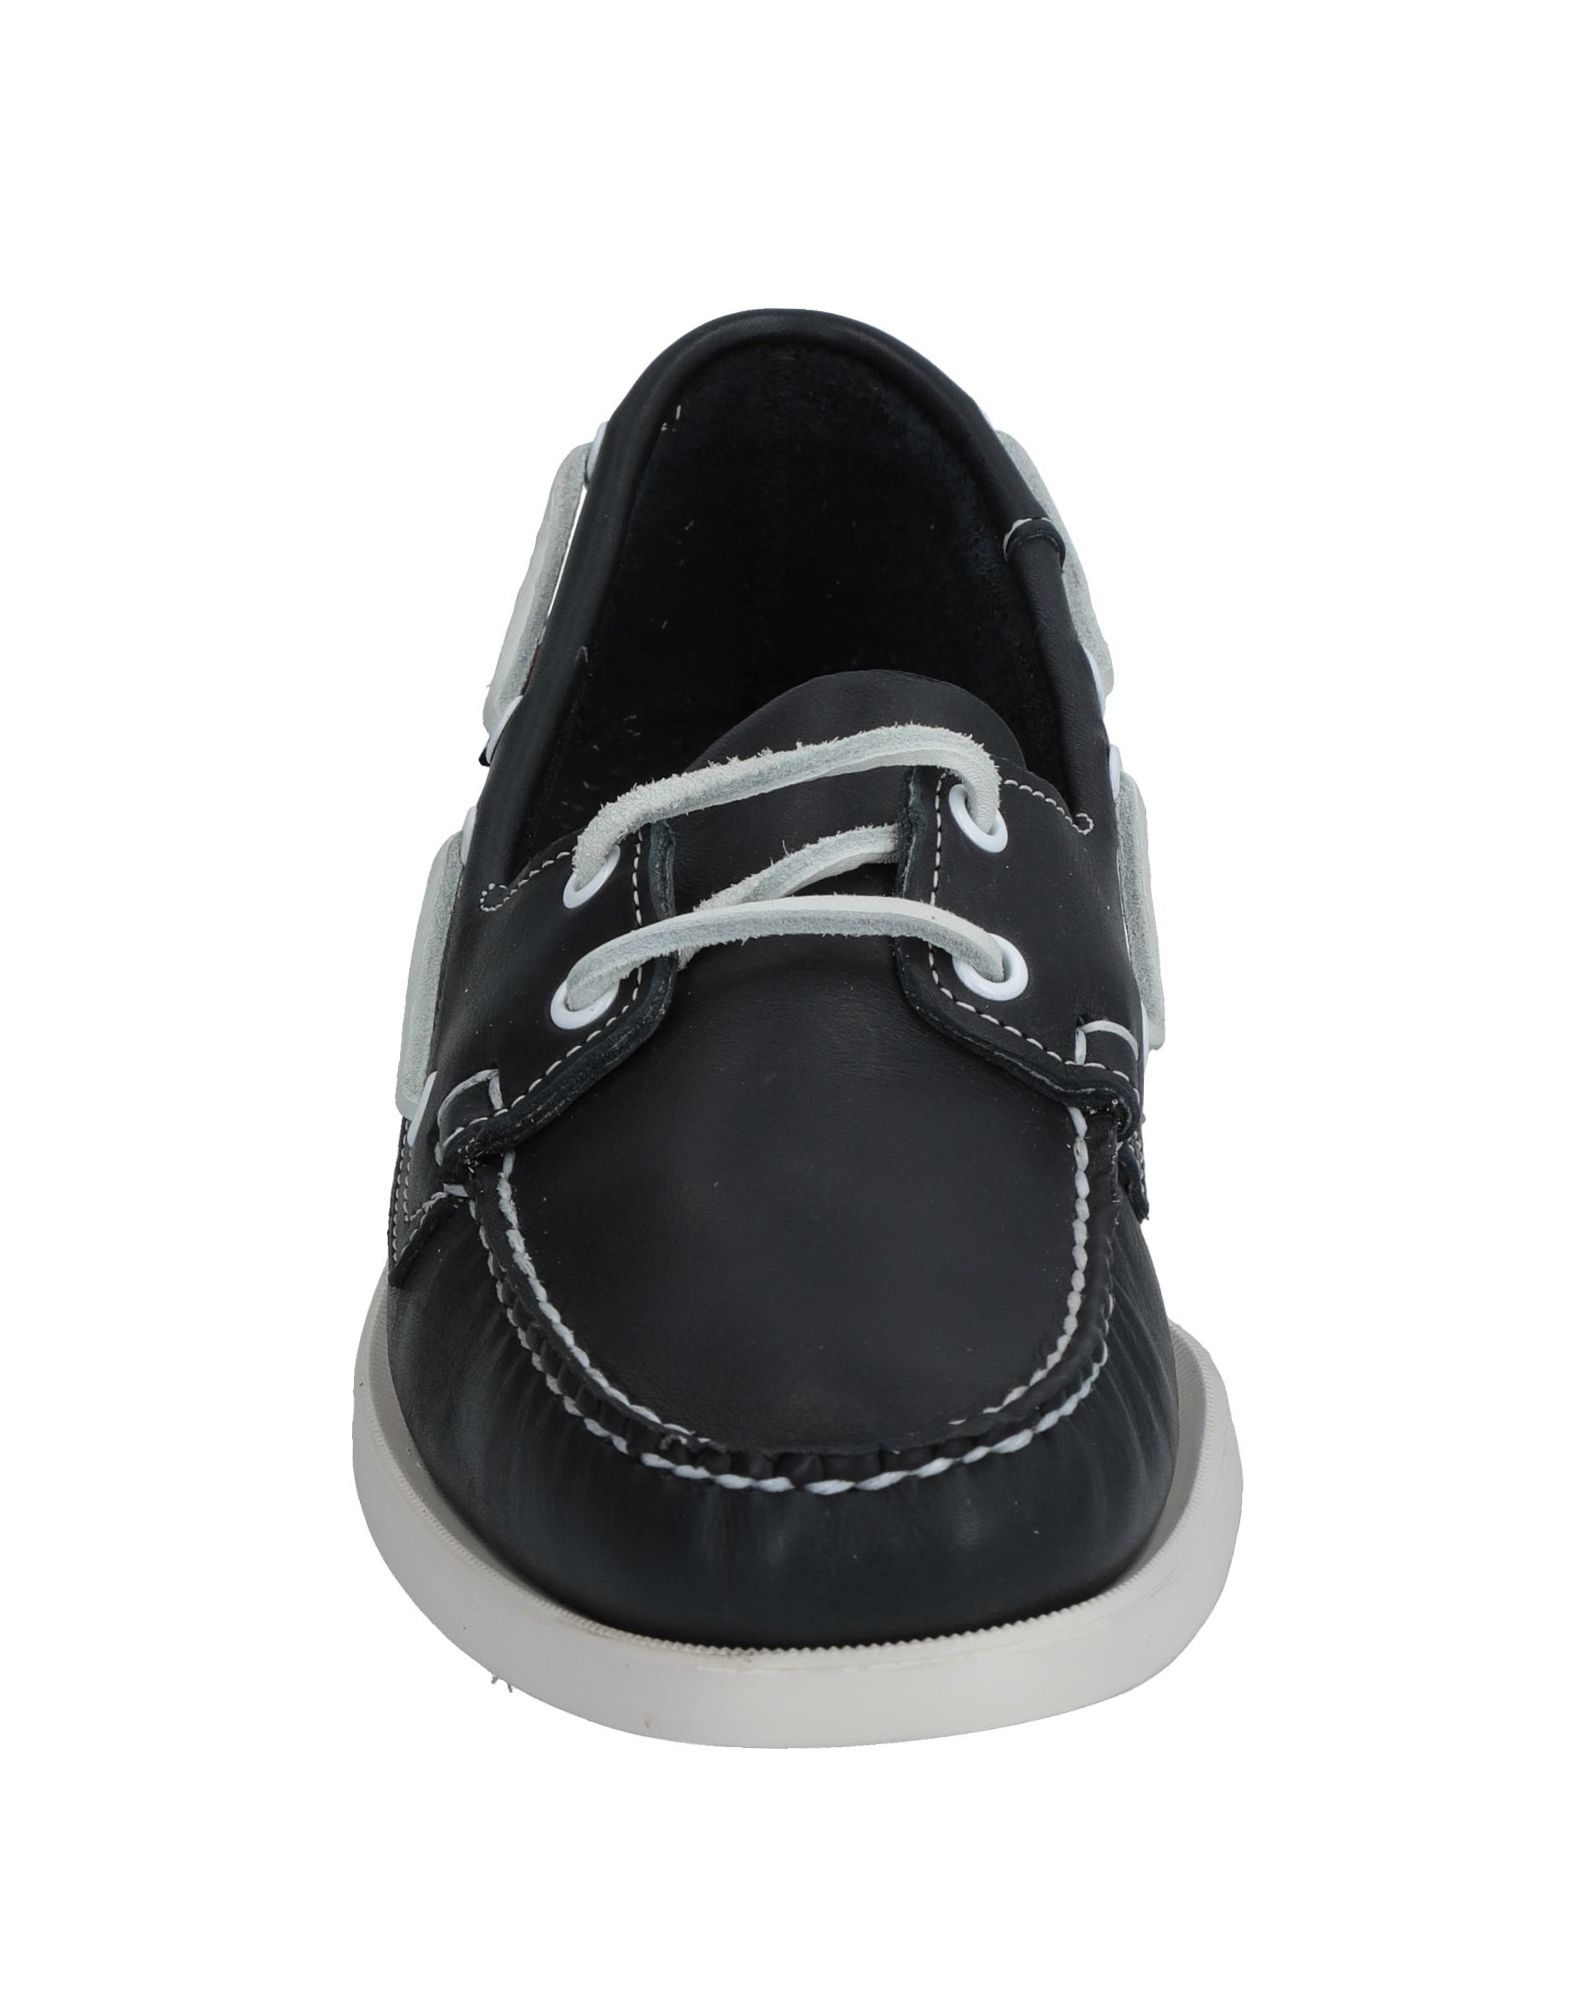 Rabatt echte Schuhe Sebago Docksides Mokassins  Herren  Mokassins 11539089UV 832801